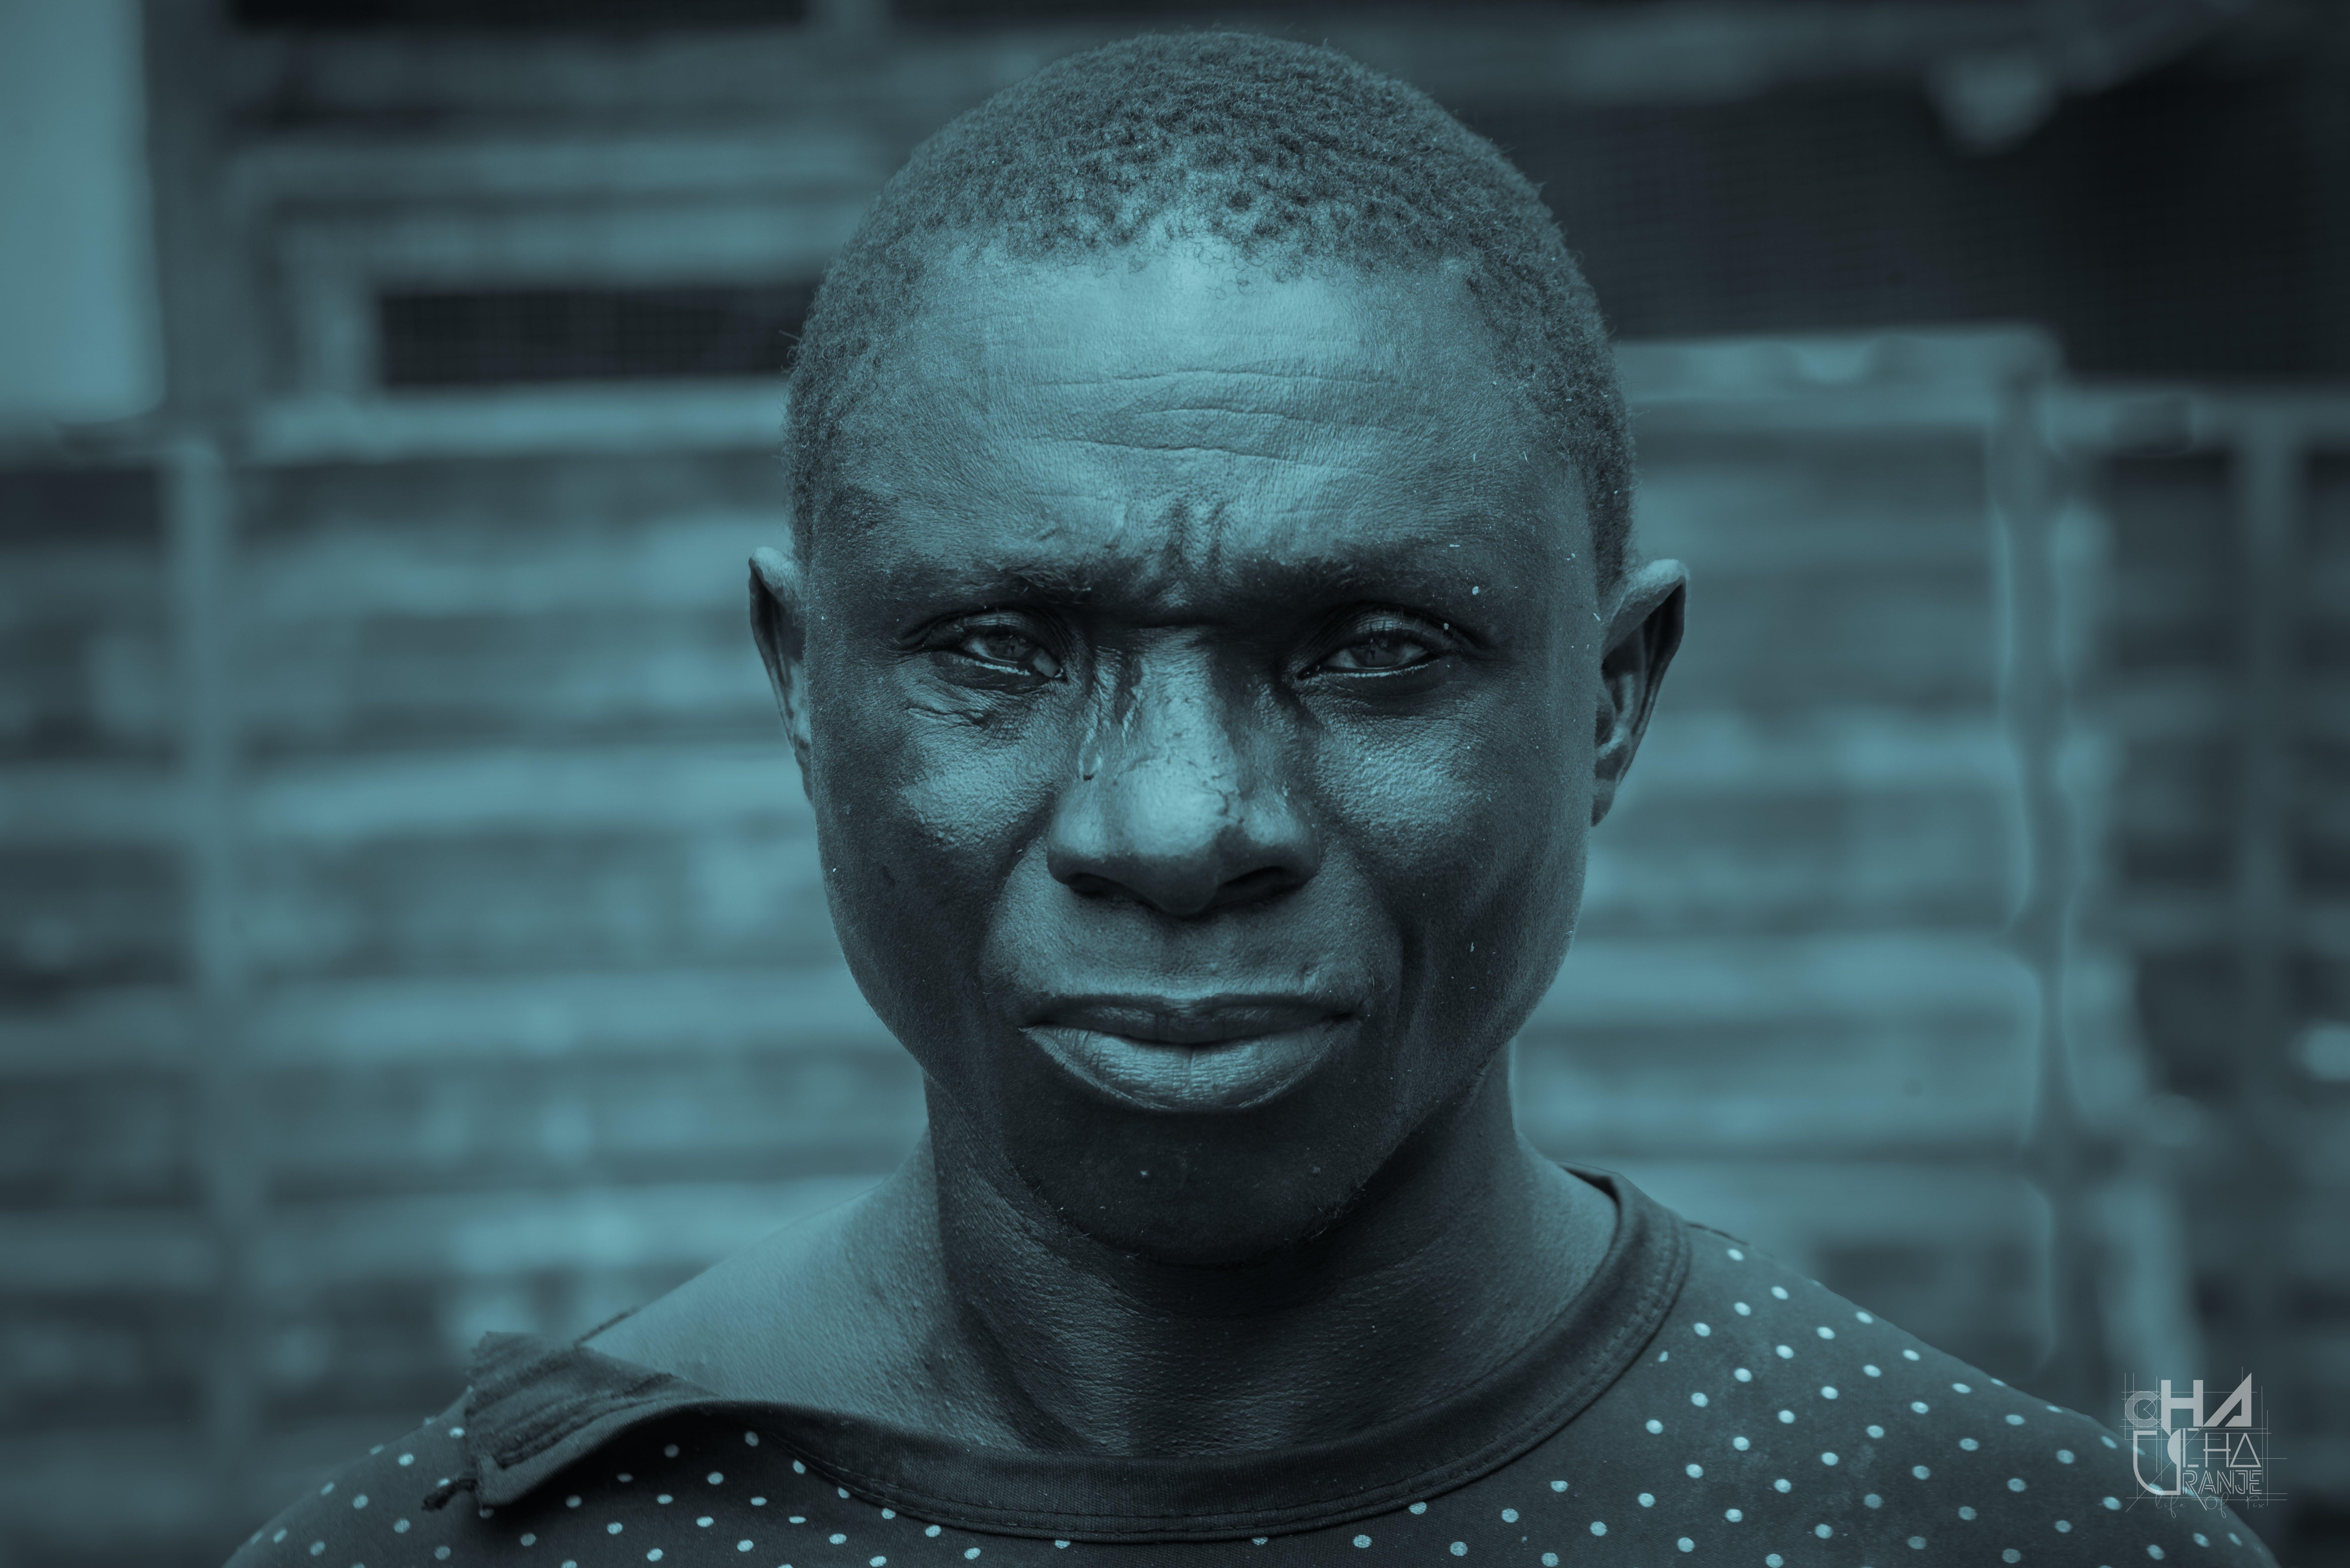 Free stock photo of #outdoorchallenge, beautiful, black guy, chaucharanje